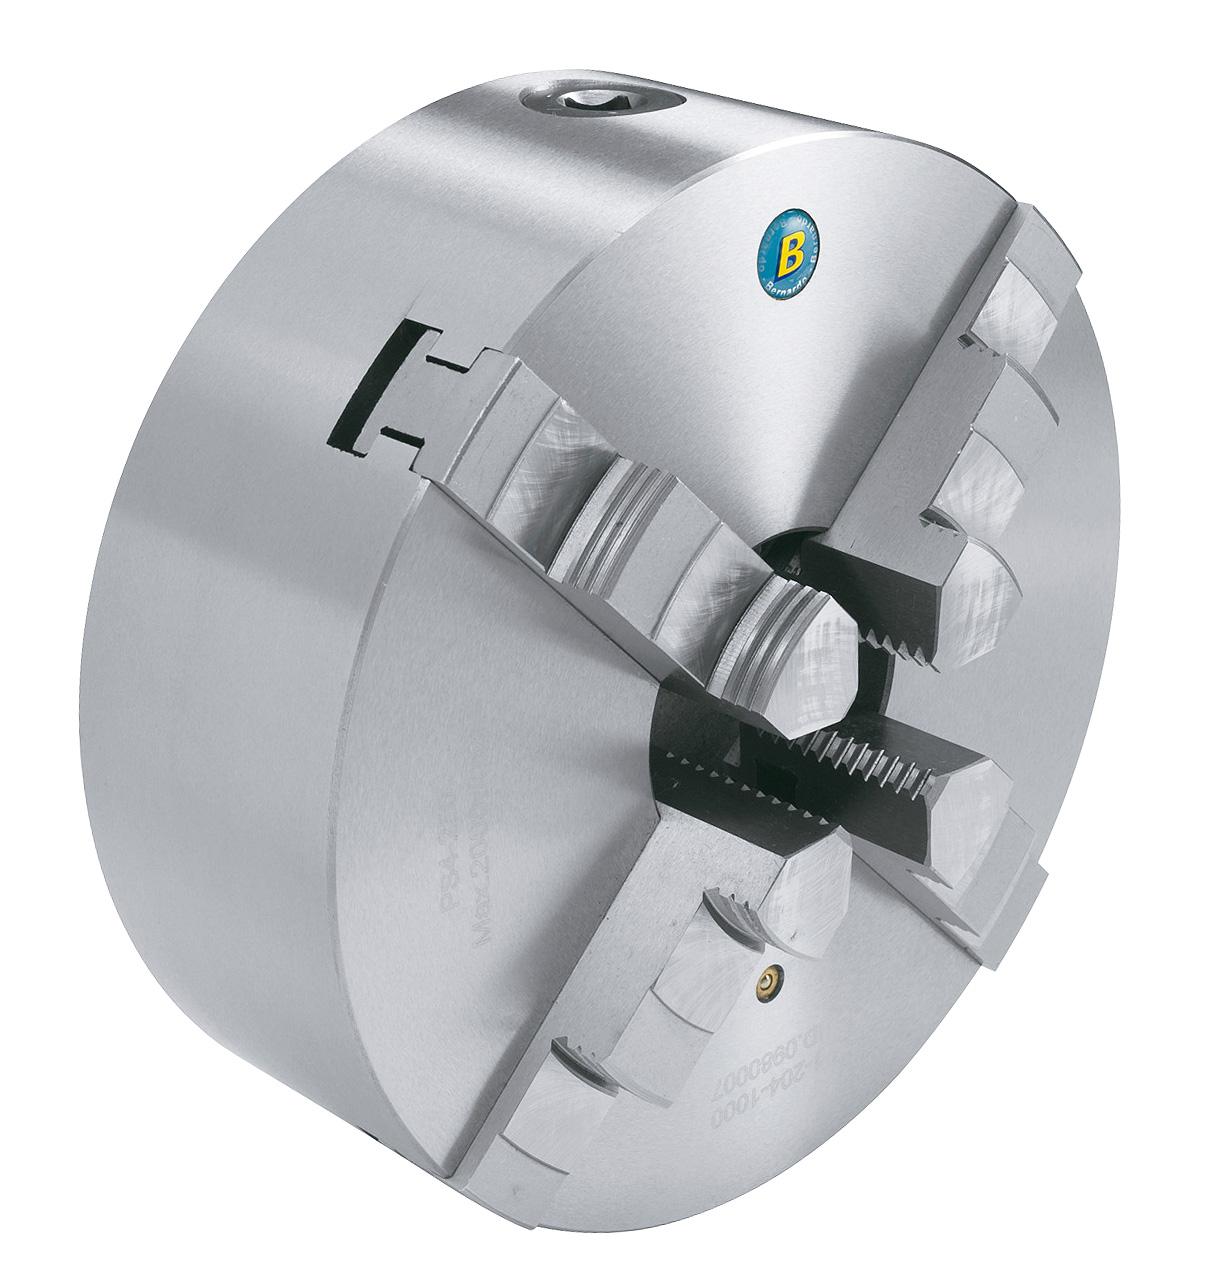 4 bakket centrerpatron standard DK12-315